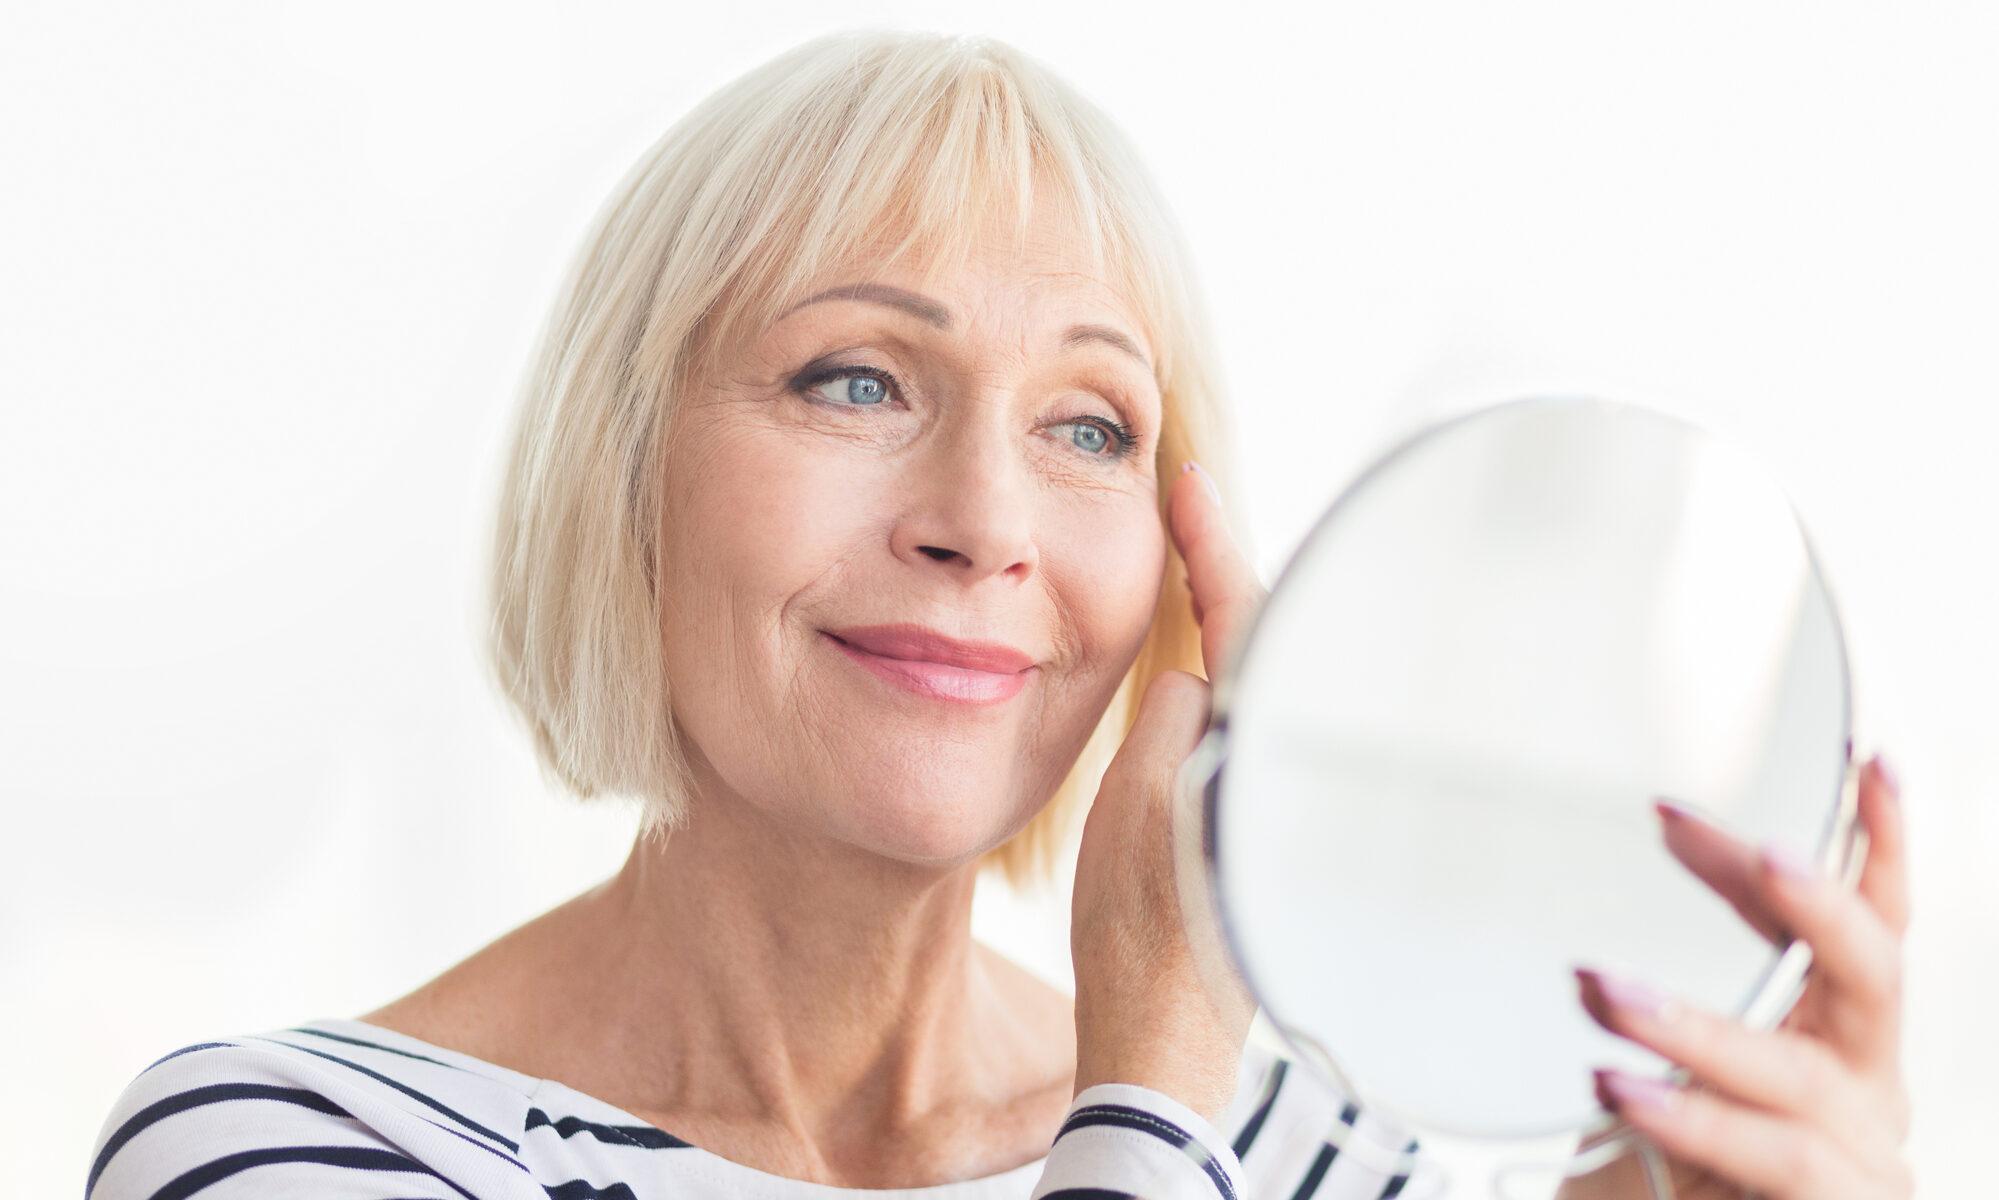 Ältere attraktive Frau schaut in den Handspiegel